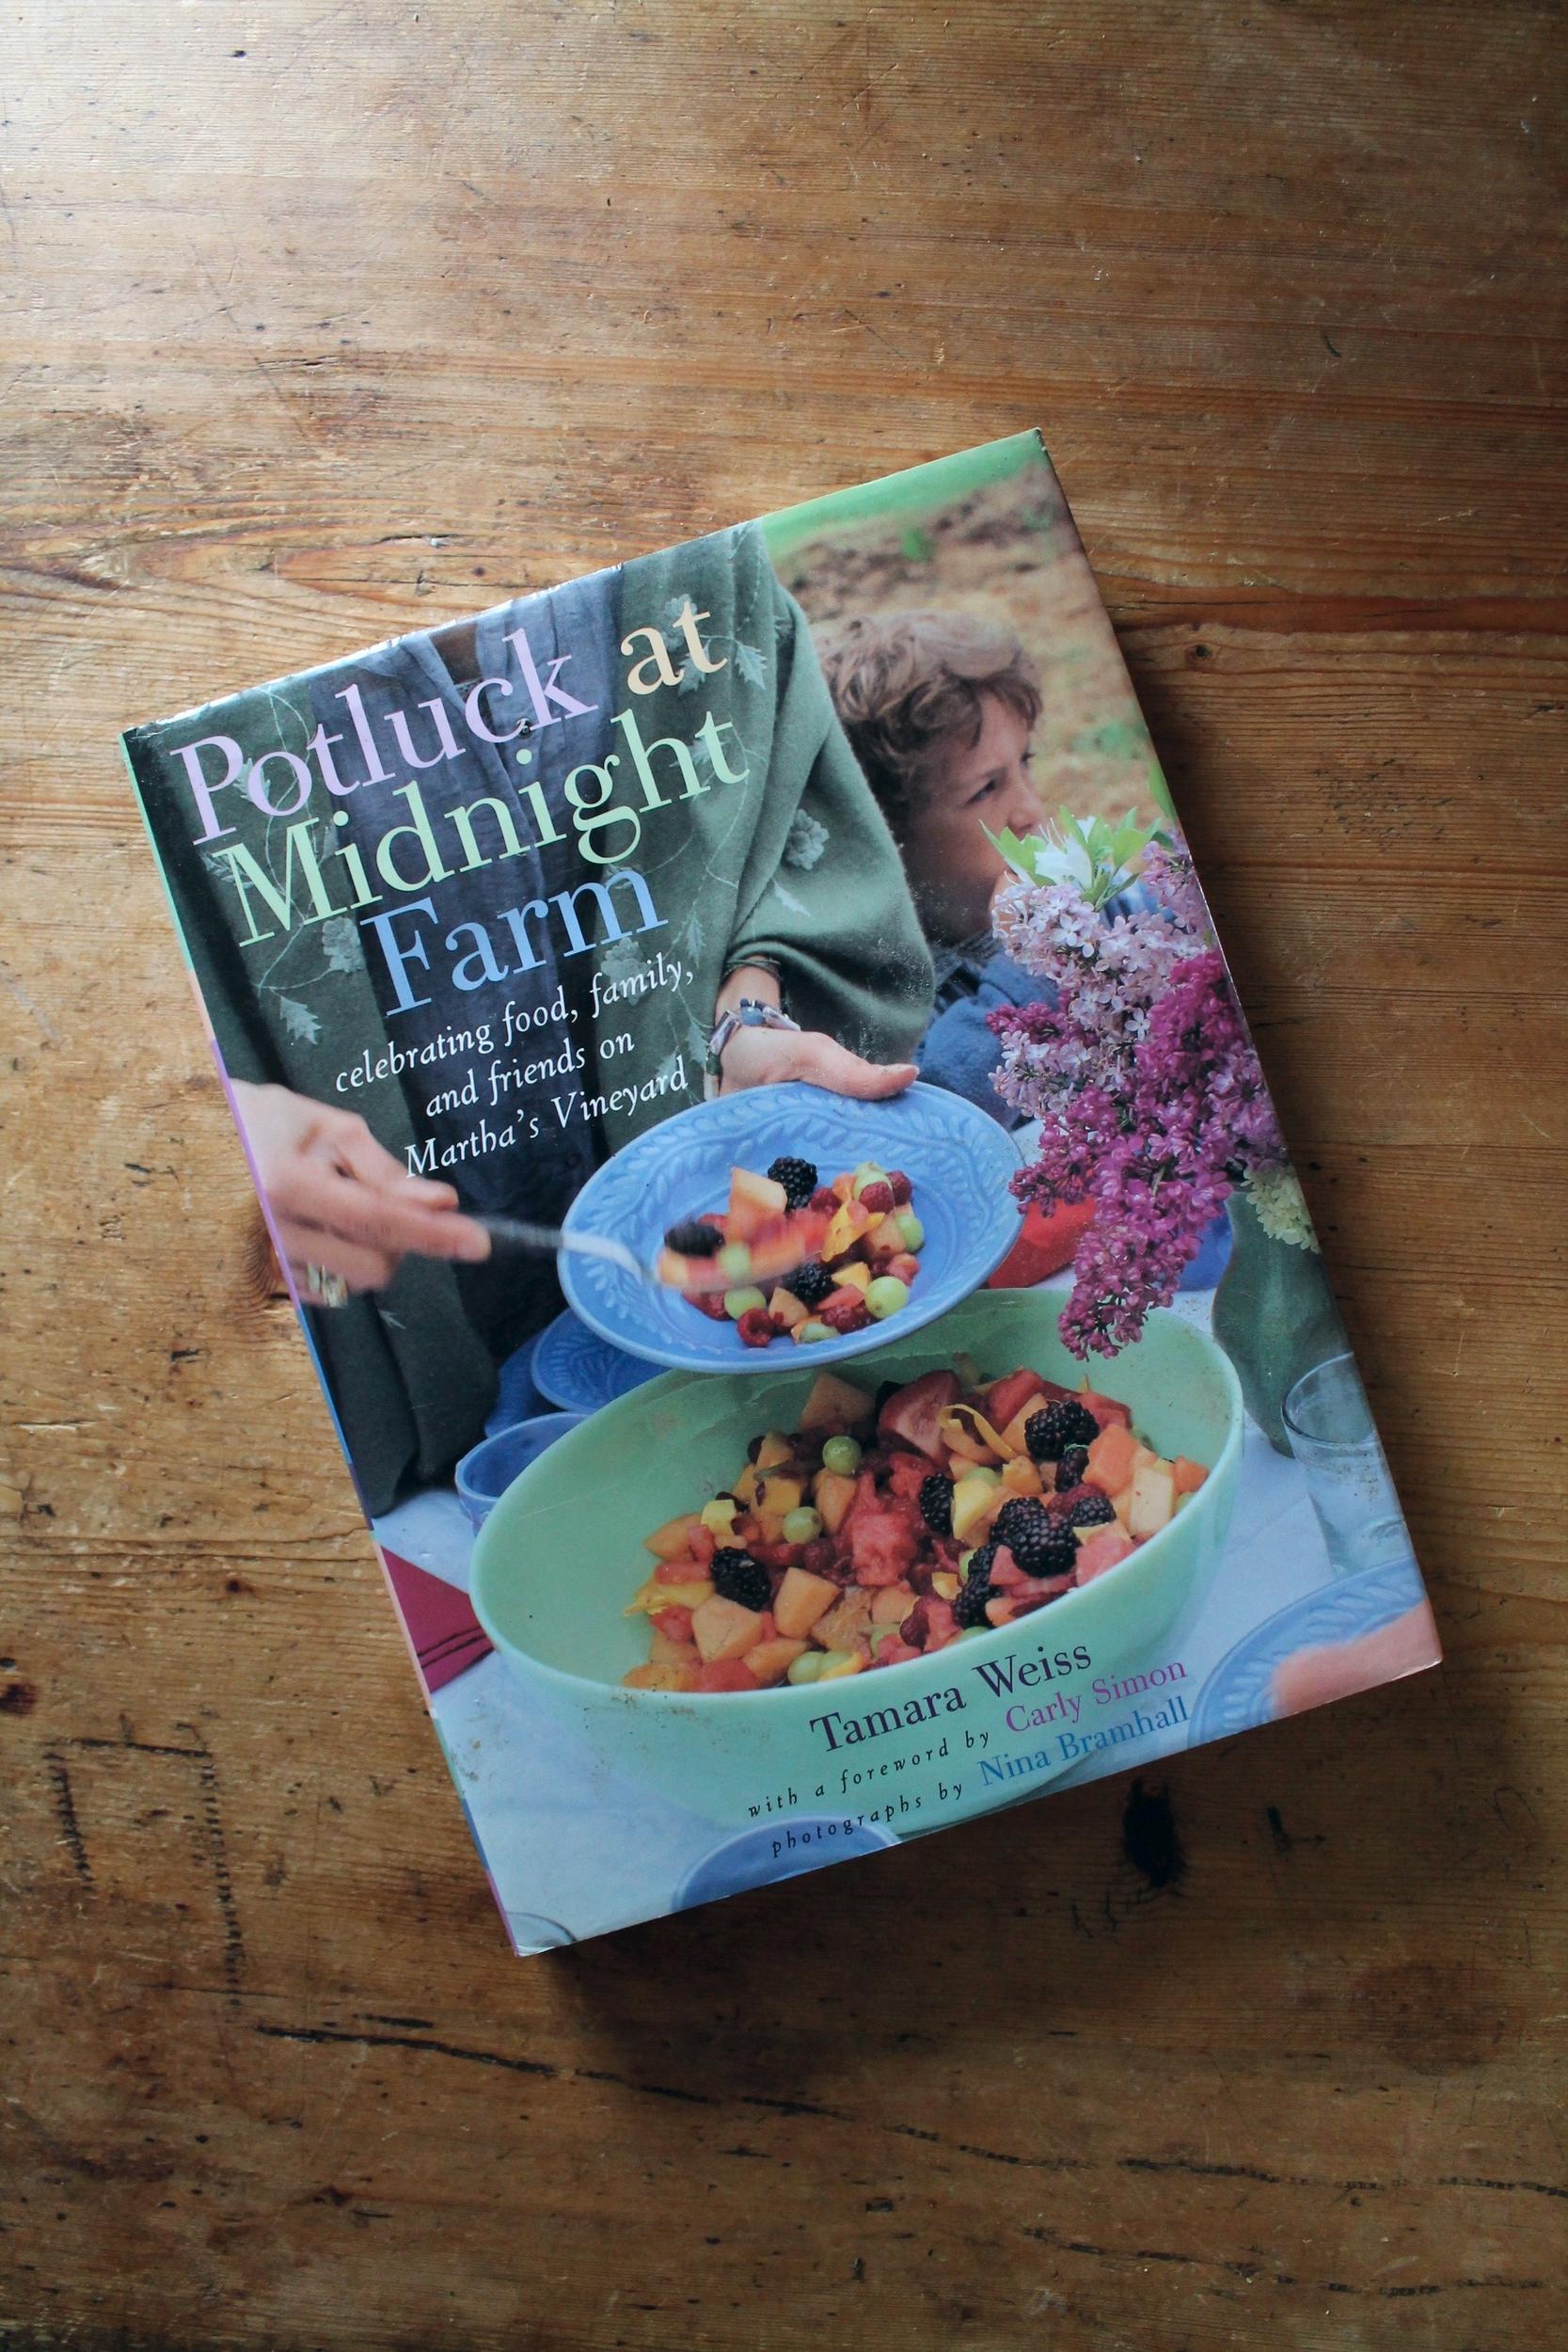 Potluck at Midnight Farm Cookbook | www.hungryinlove.com